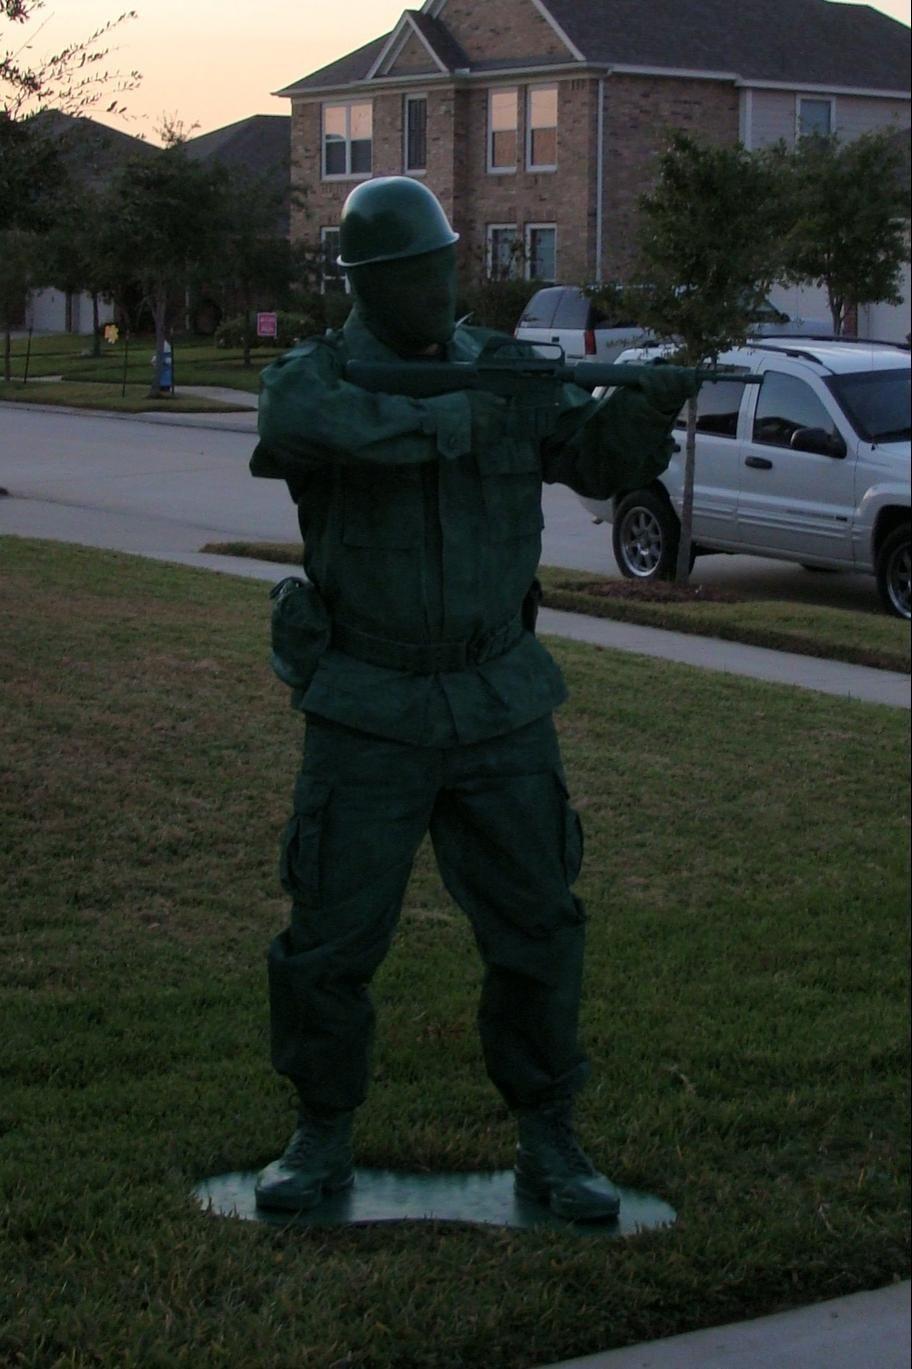 31 Soldier Halloween Costume Girl bffhalloweencostumes